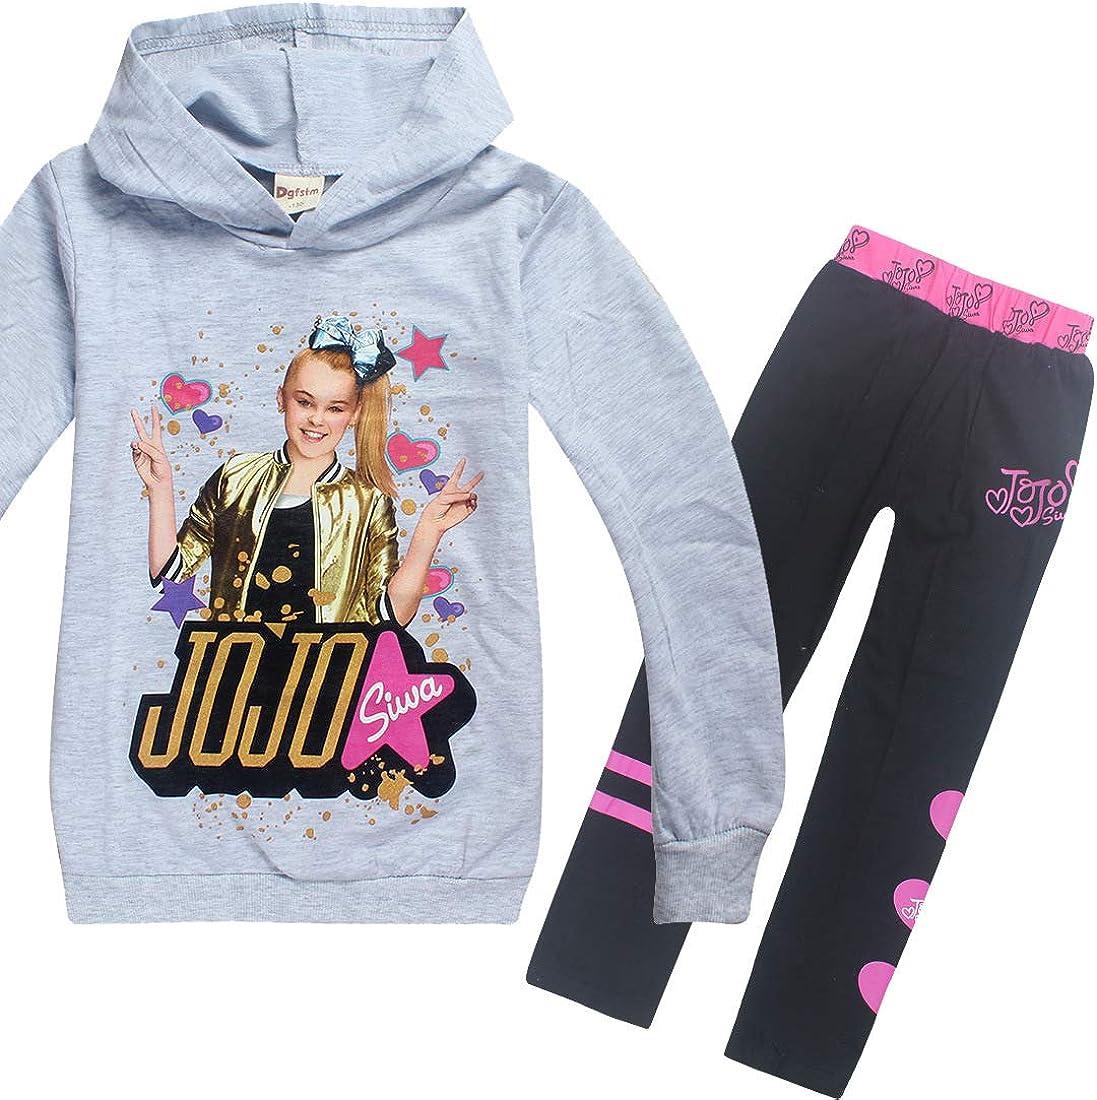 Girls Hoodies Sets Casual Sweatshirts Shirt Tops Clothes and Trousers for JoJo Siwa Girls